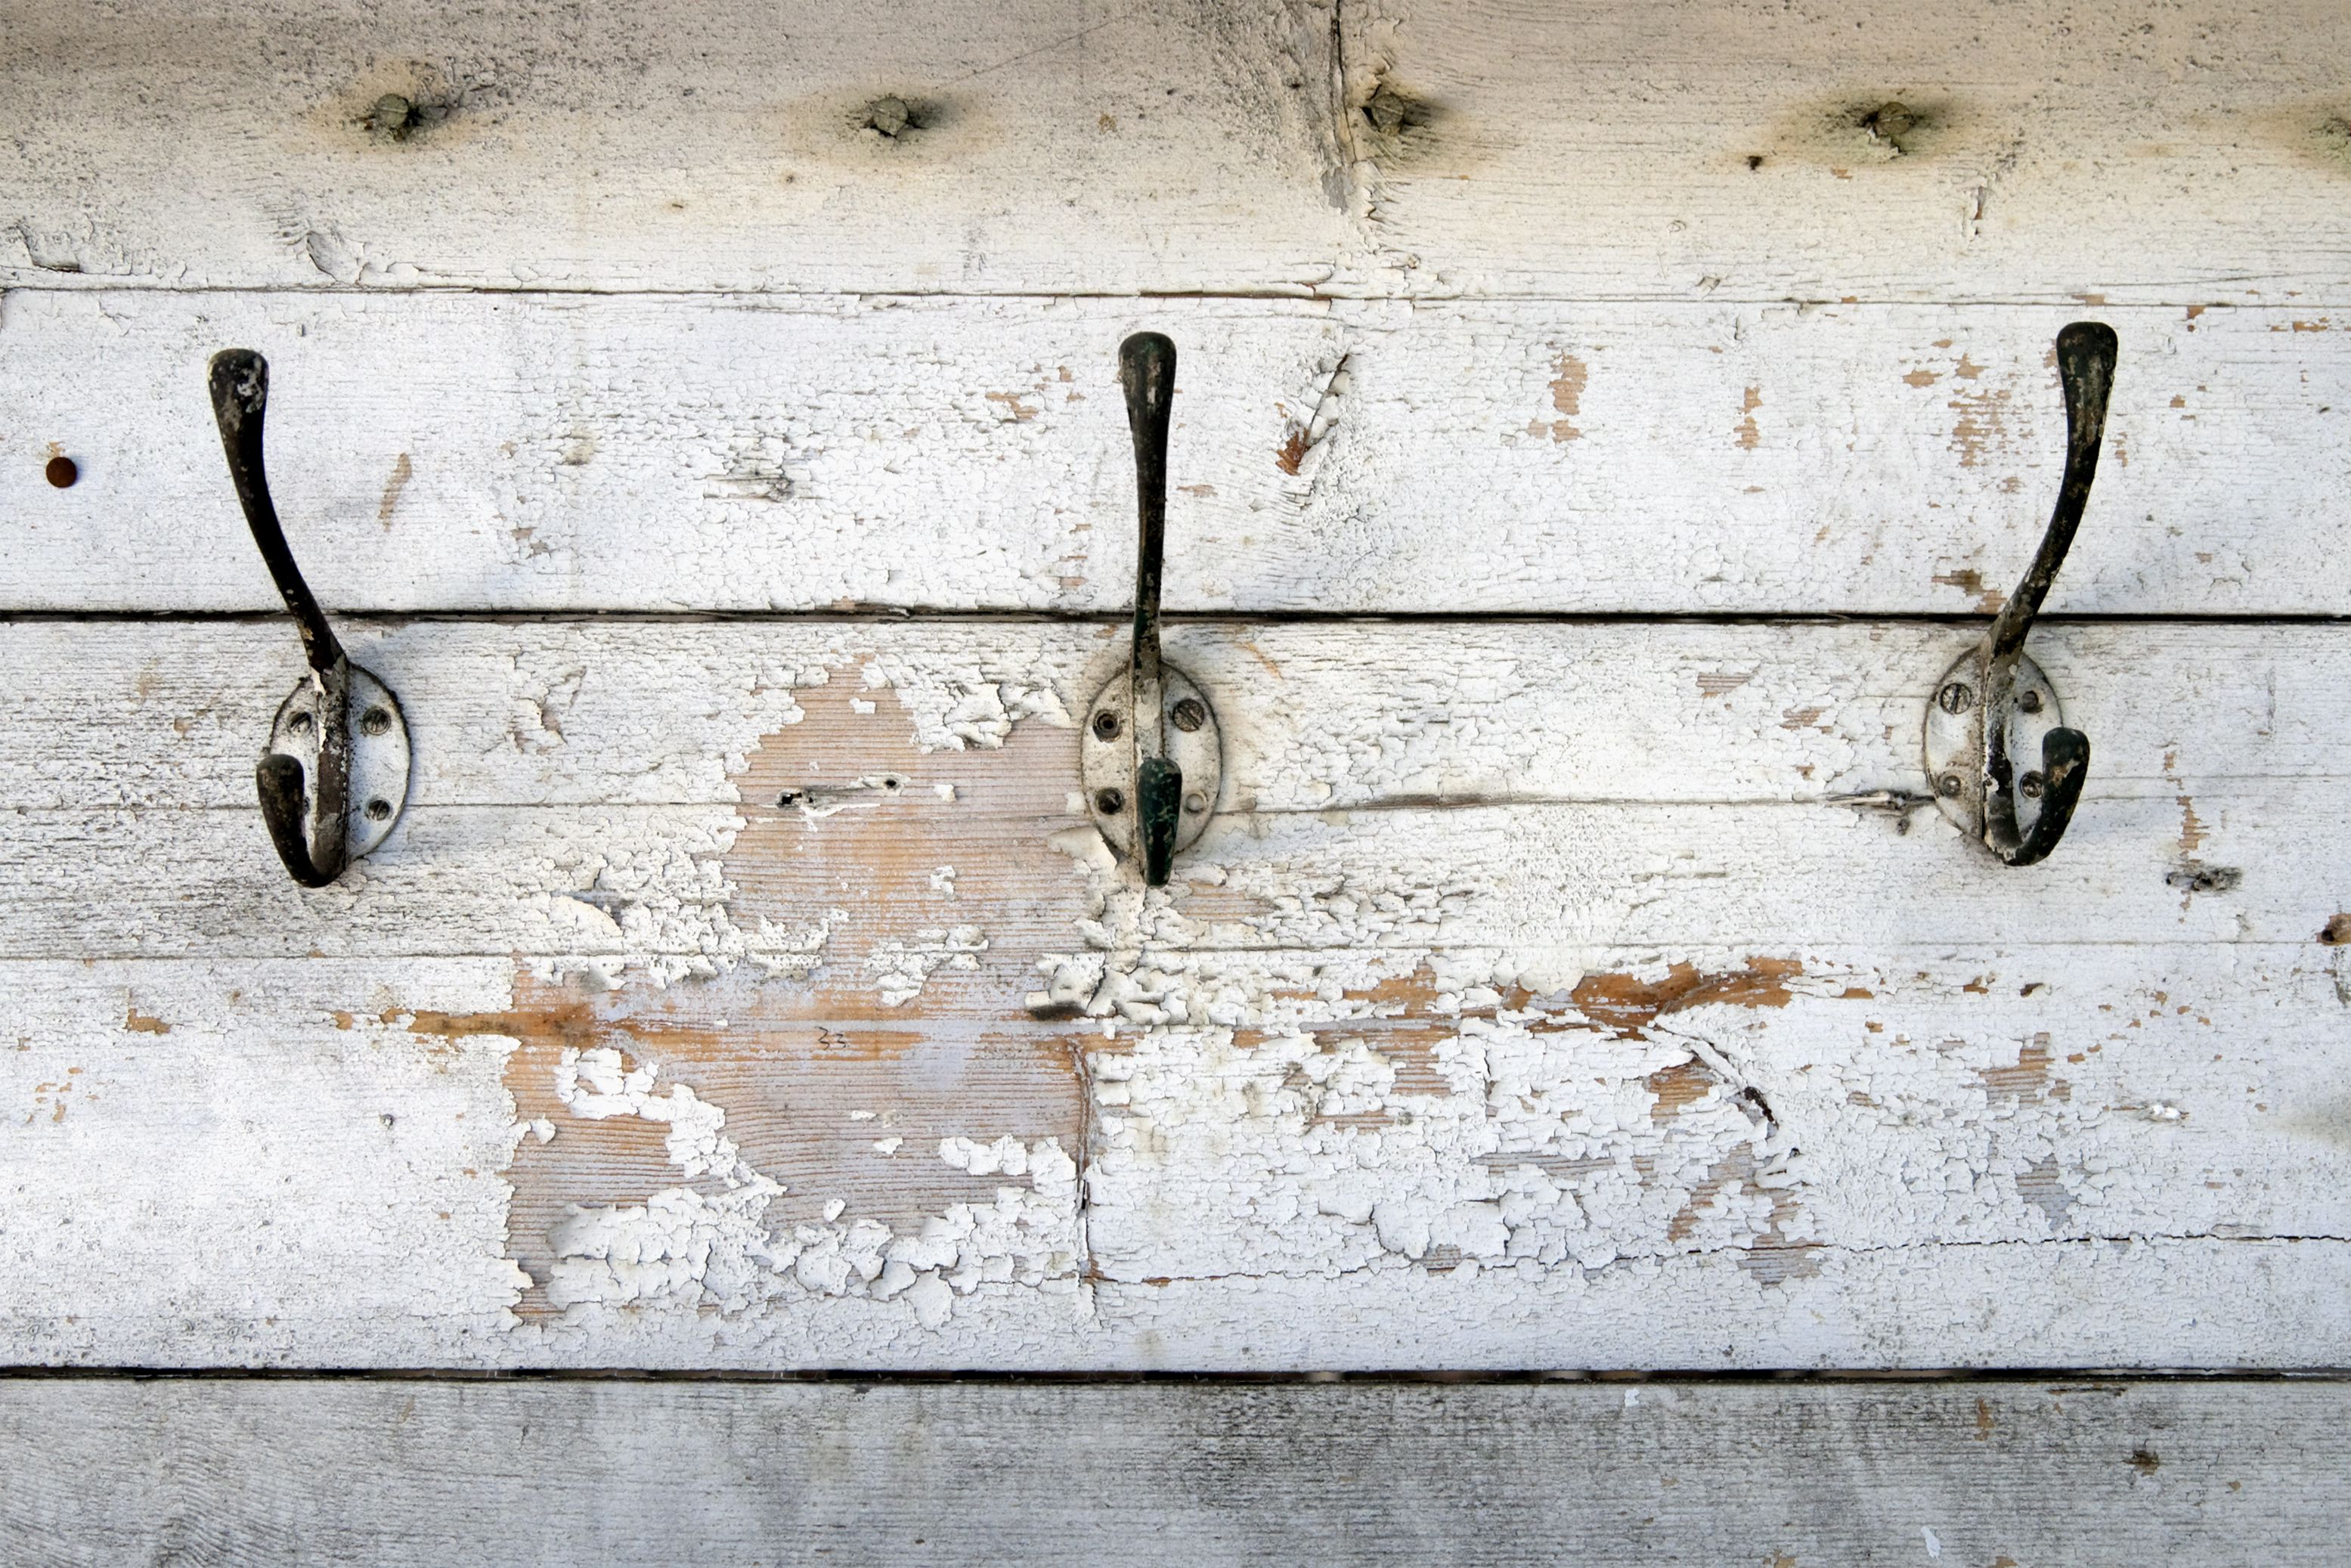 Coat hooks on a rustic wood plank wall